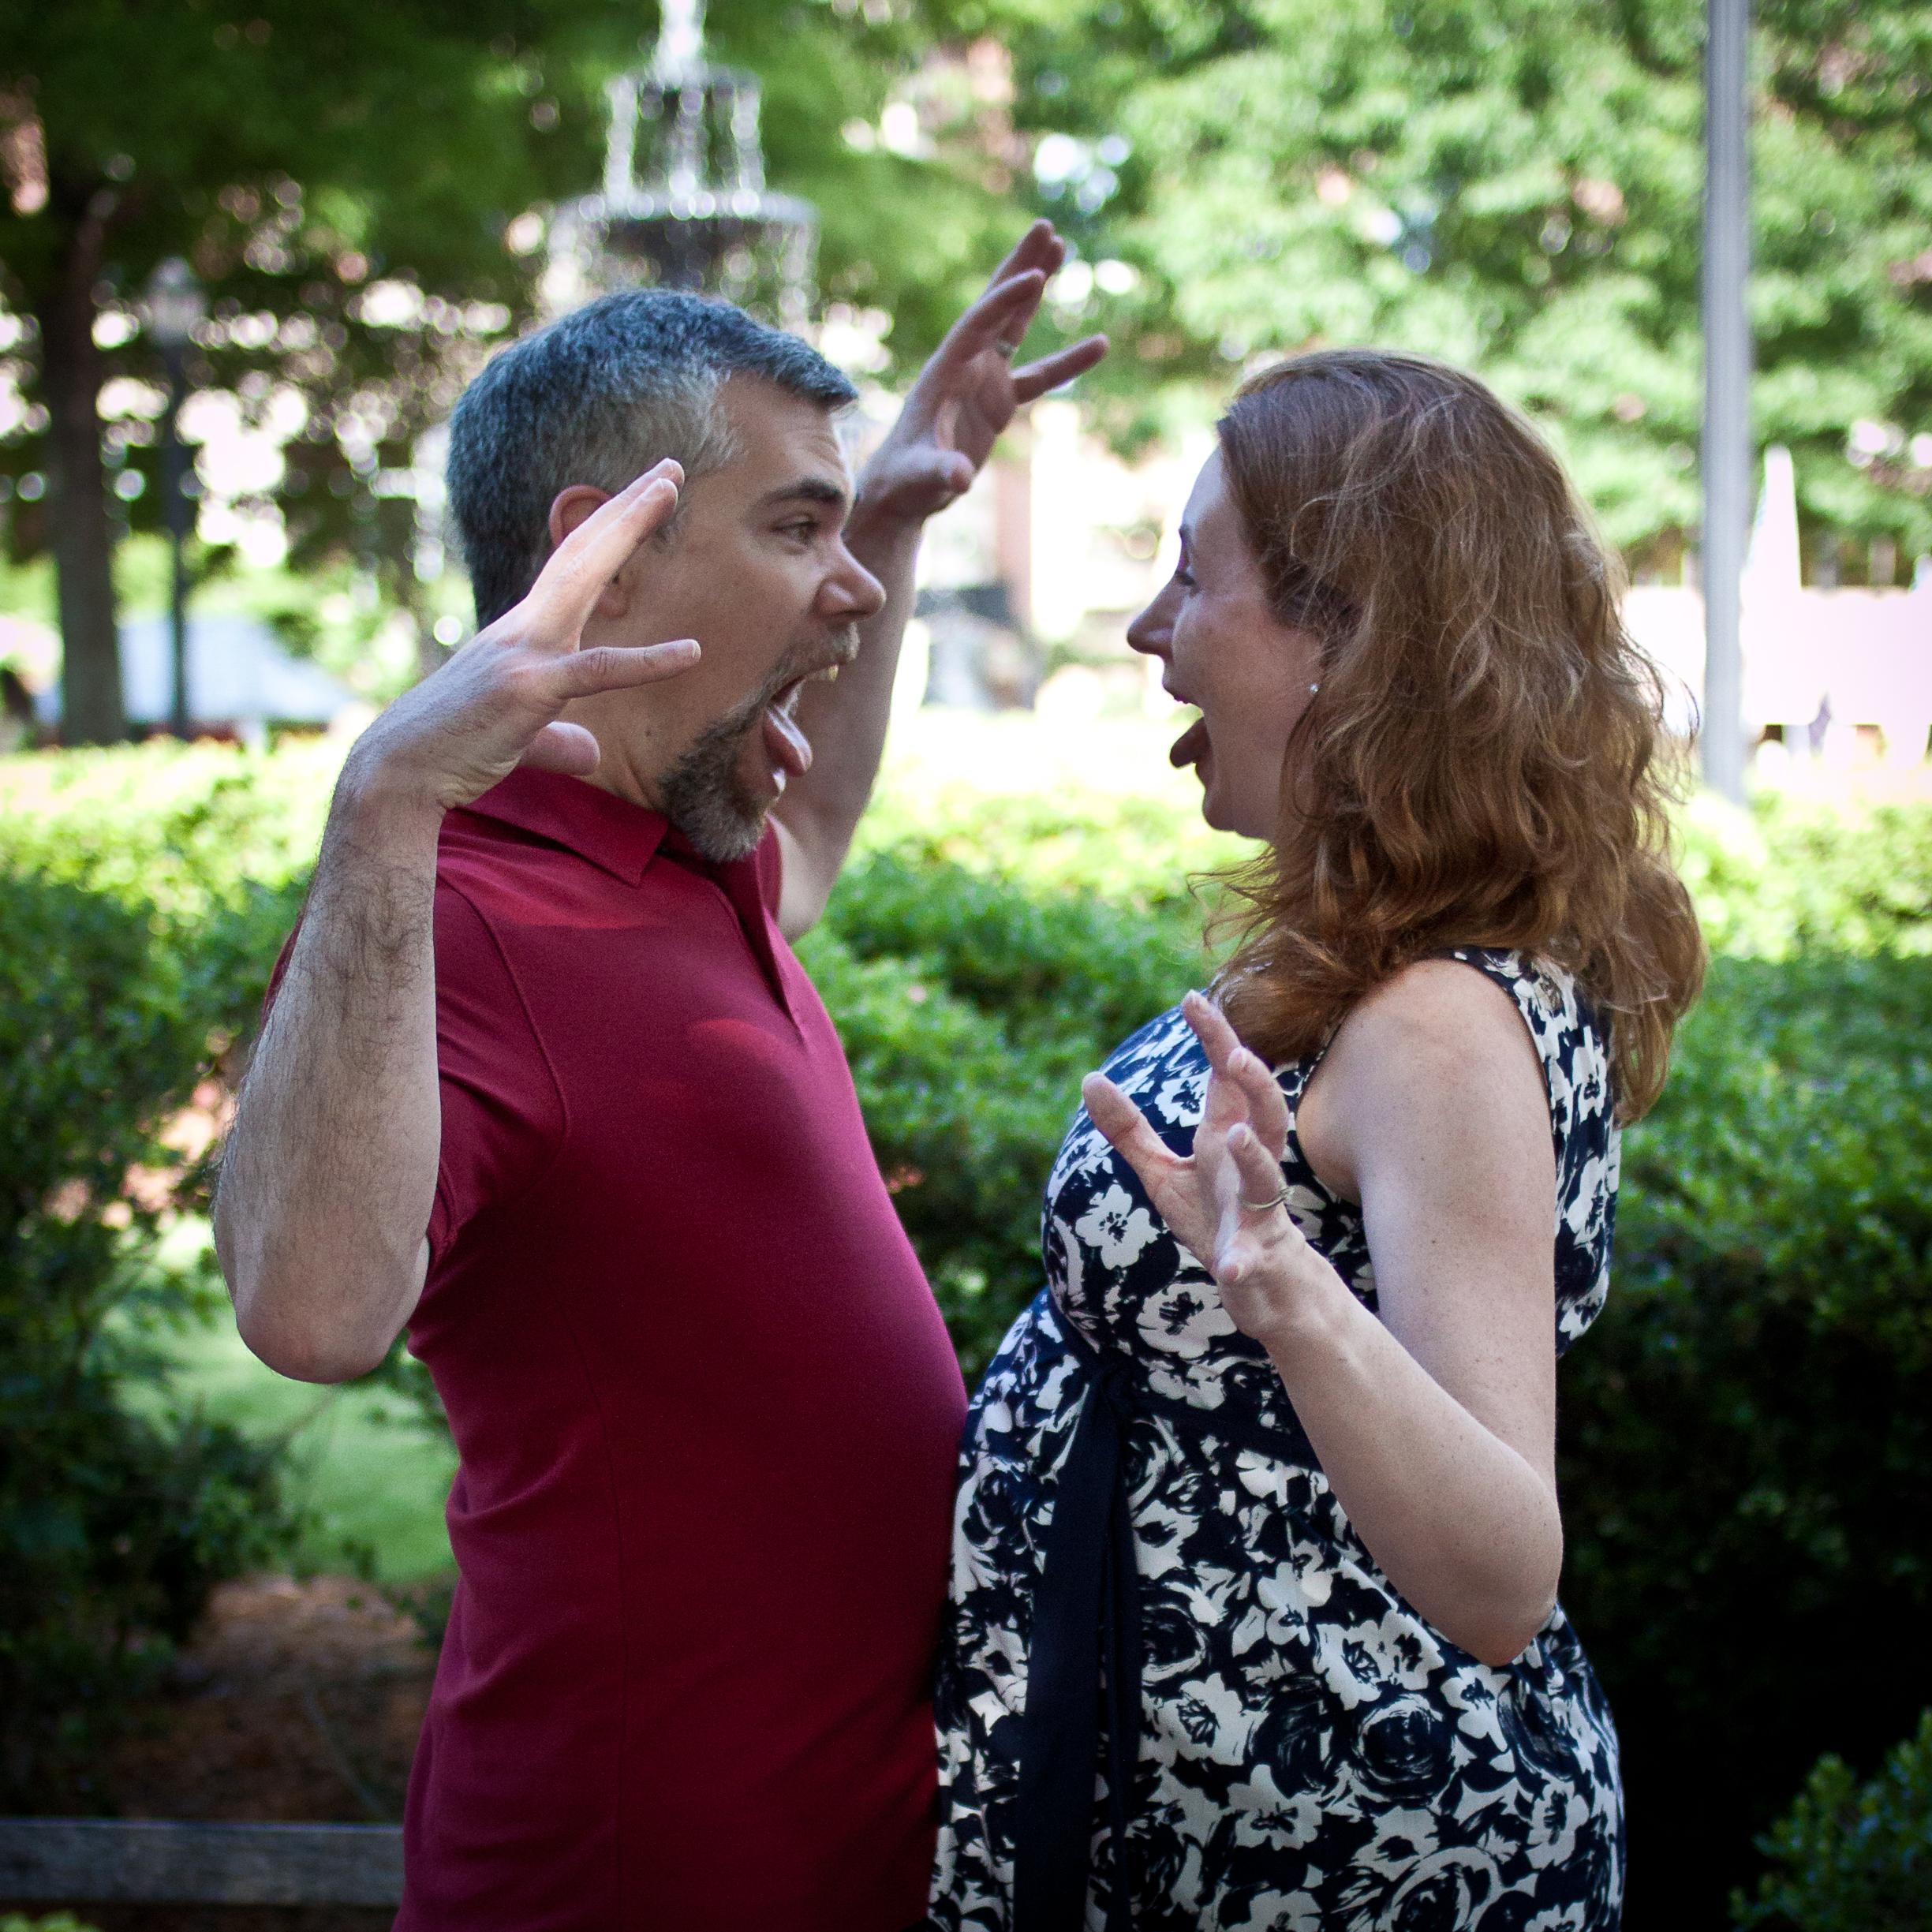 Jenn and Bill in Marietta Square: Spring 2013